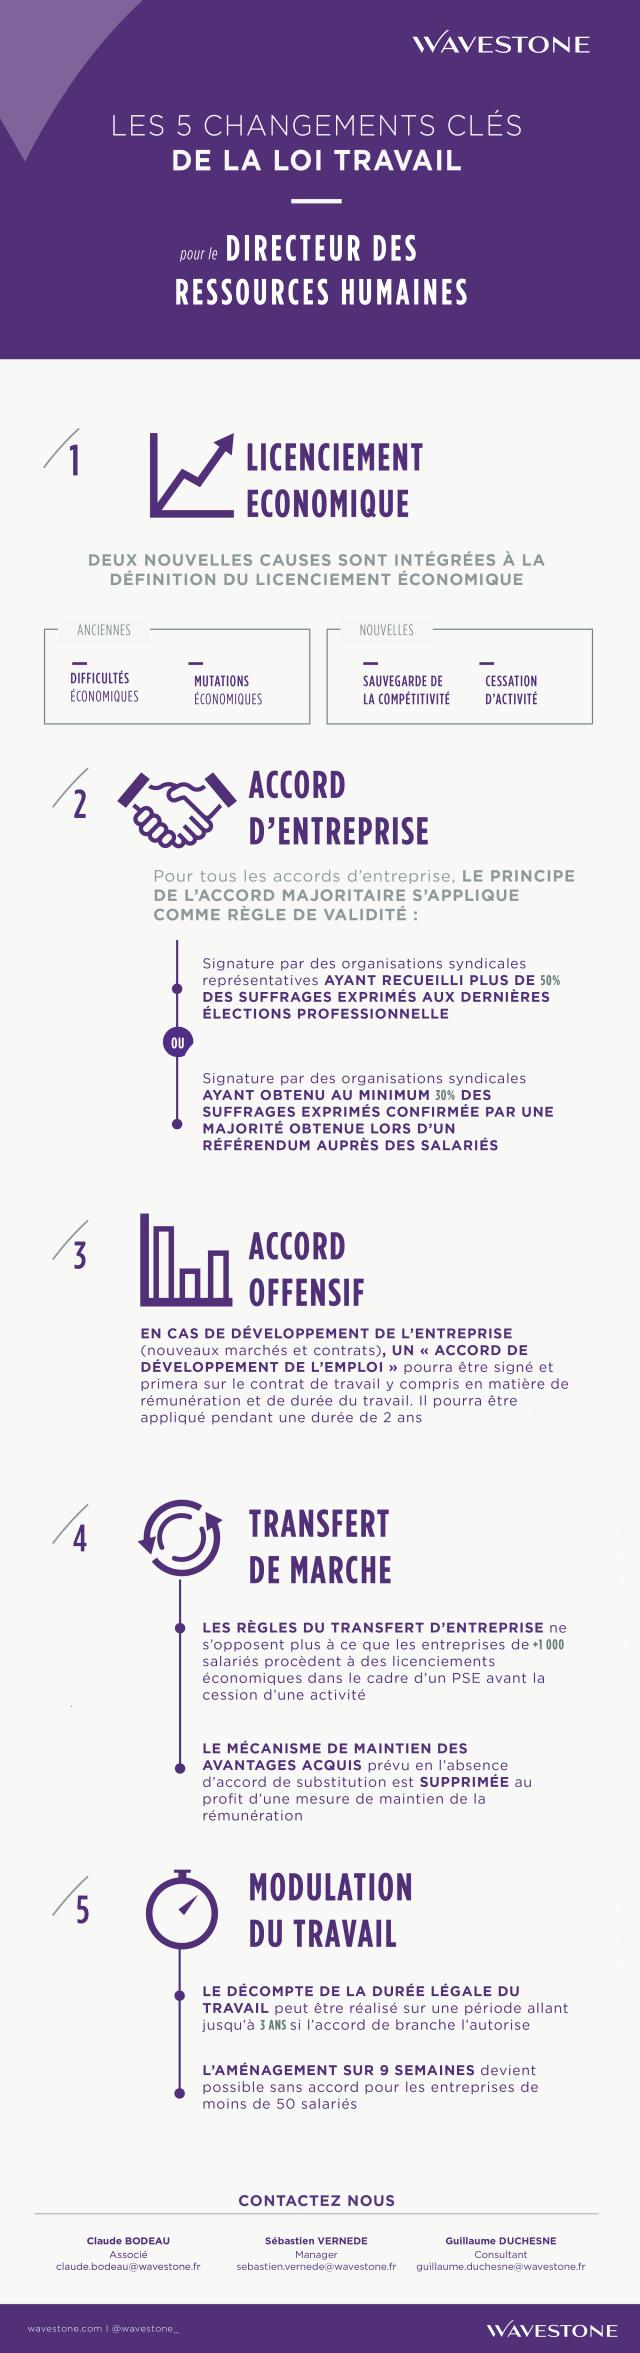 infographie-dir-rh-vf